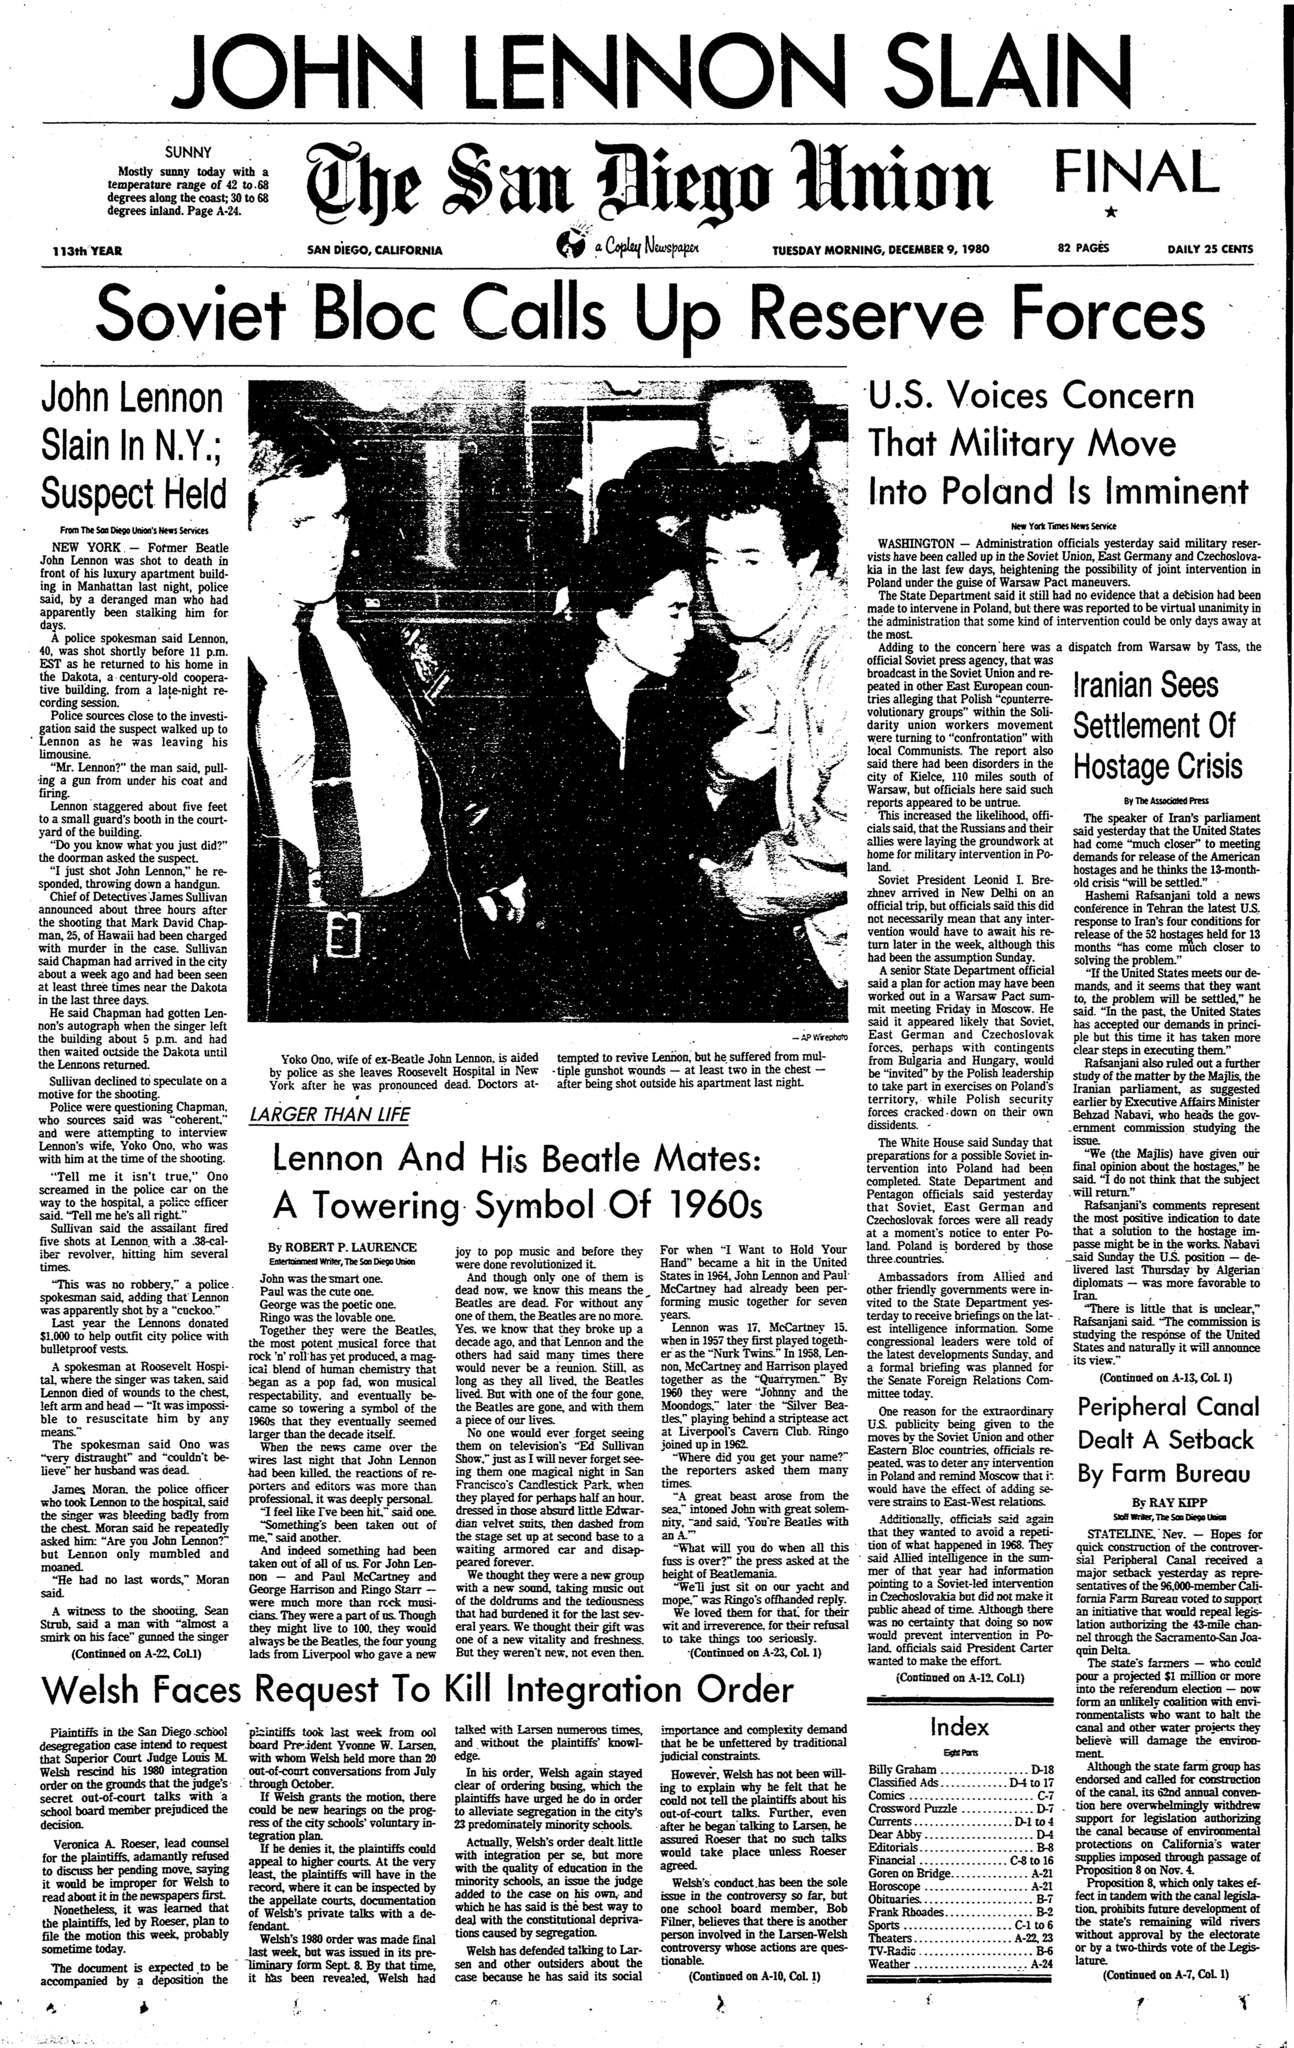 December 9, 1980